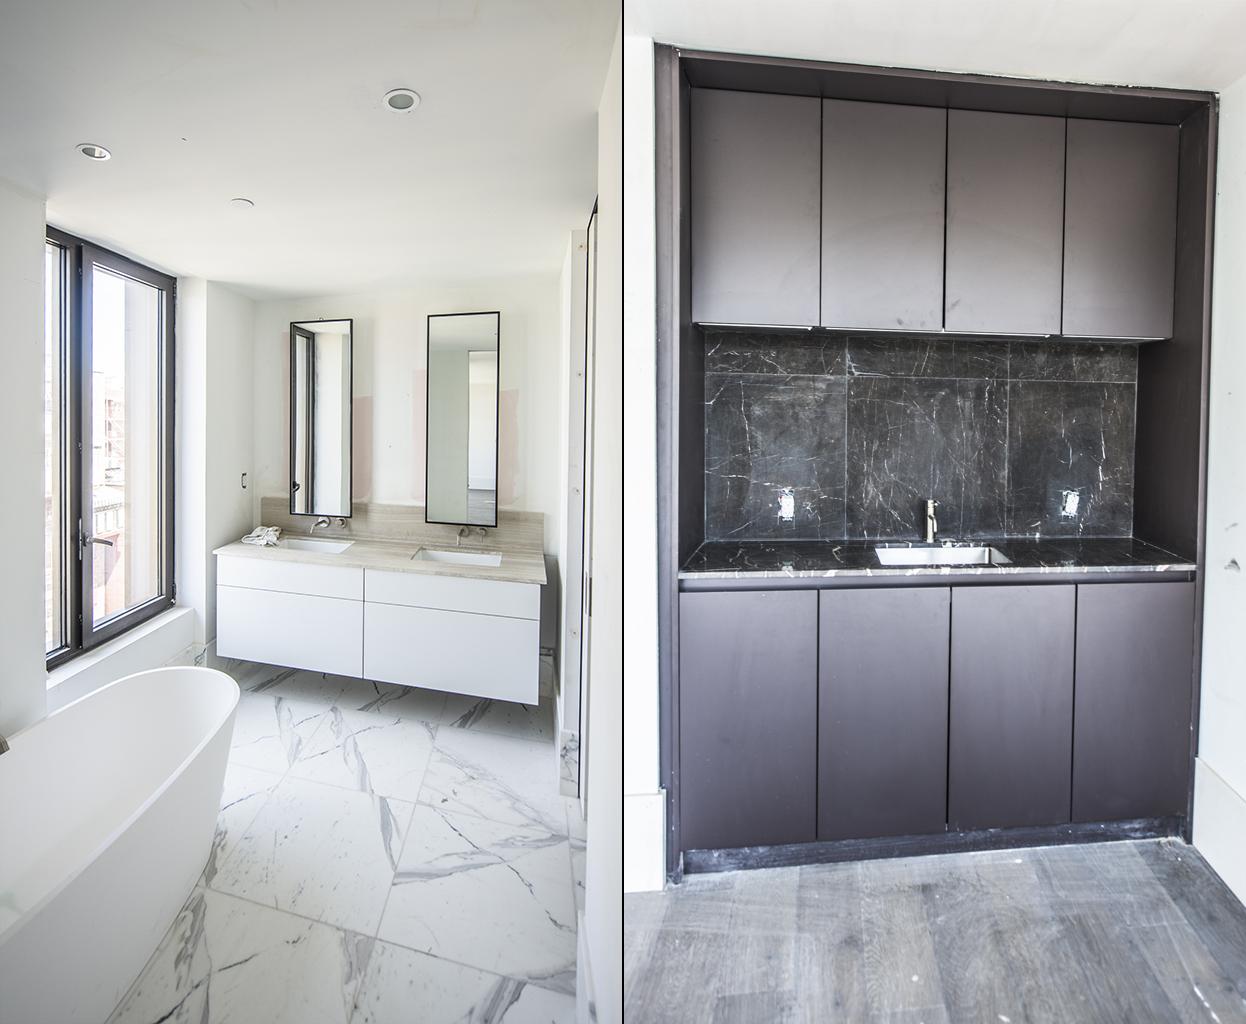 Oosten bathroom and kitchen